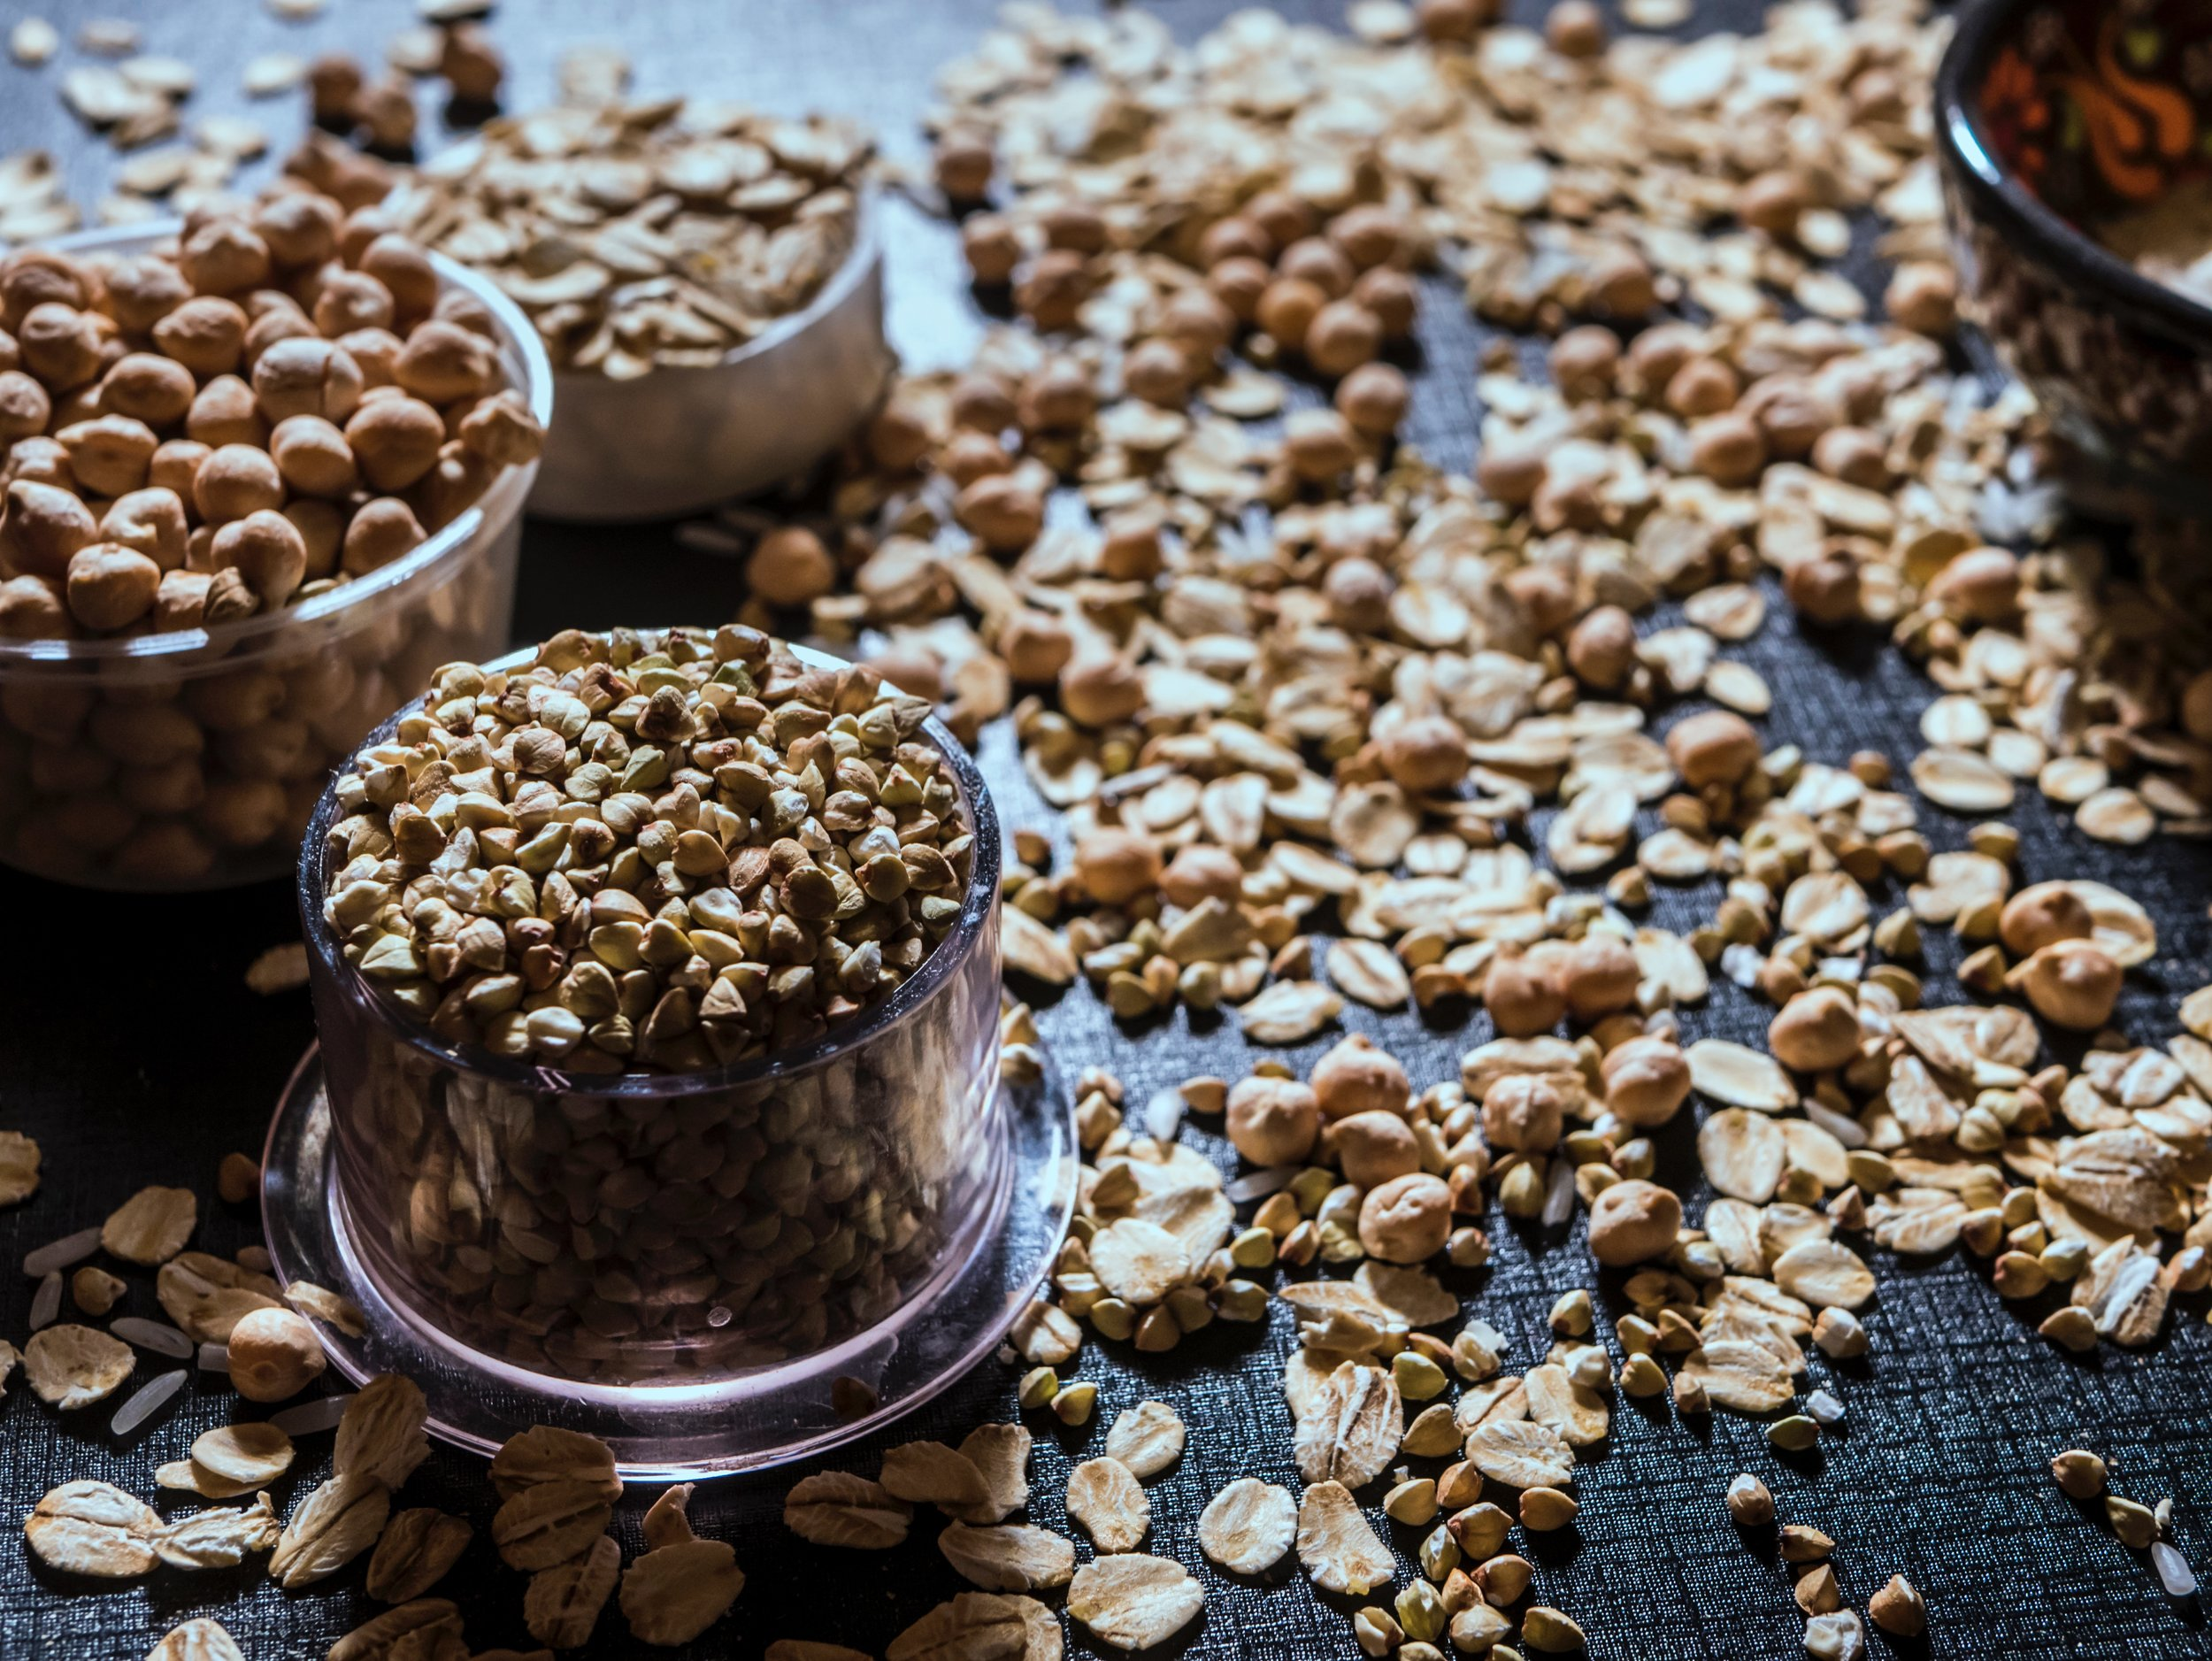 beans-brown-cereals-1192037.jpg